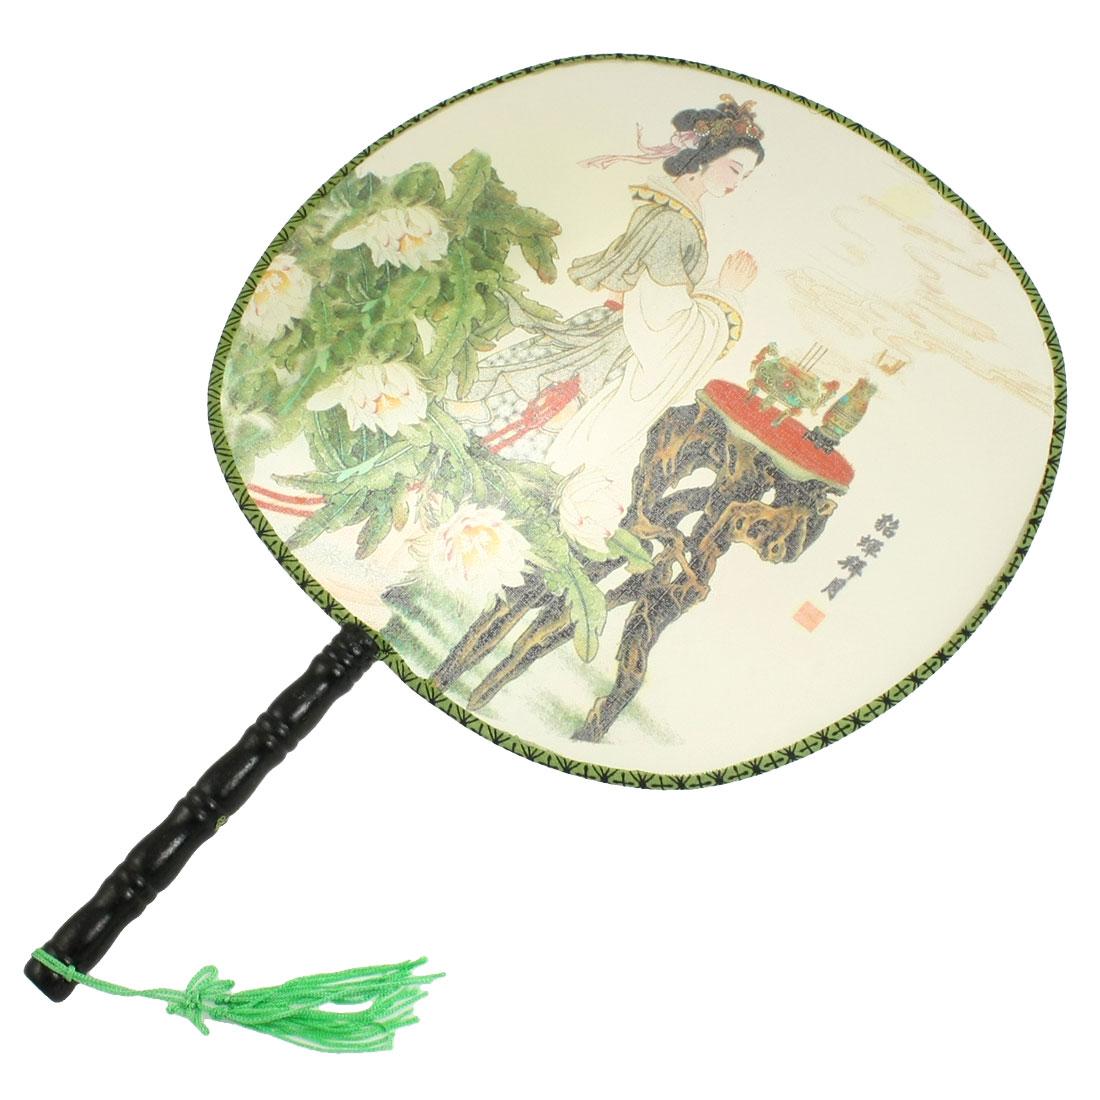 Beauty Diao Chan Print Tassel Decor Black Wooden Handle Round Hand Fan